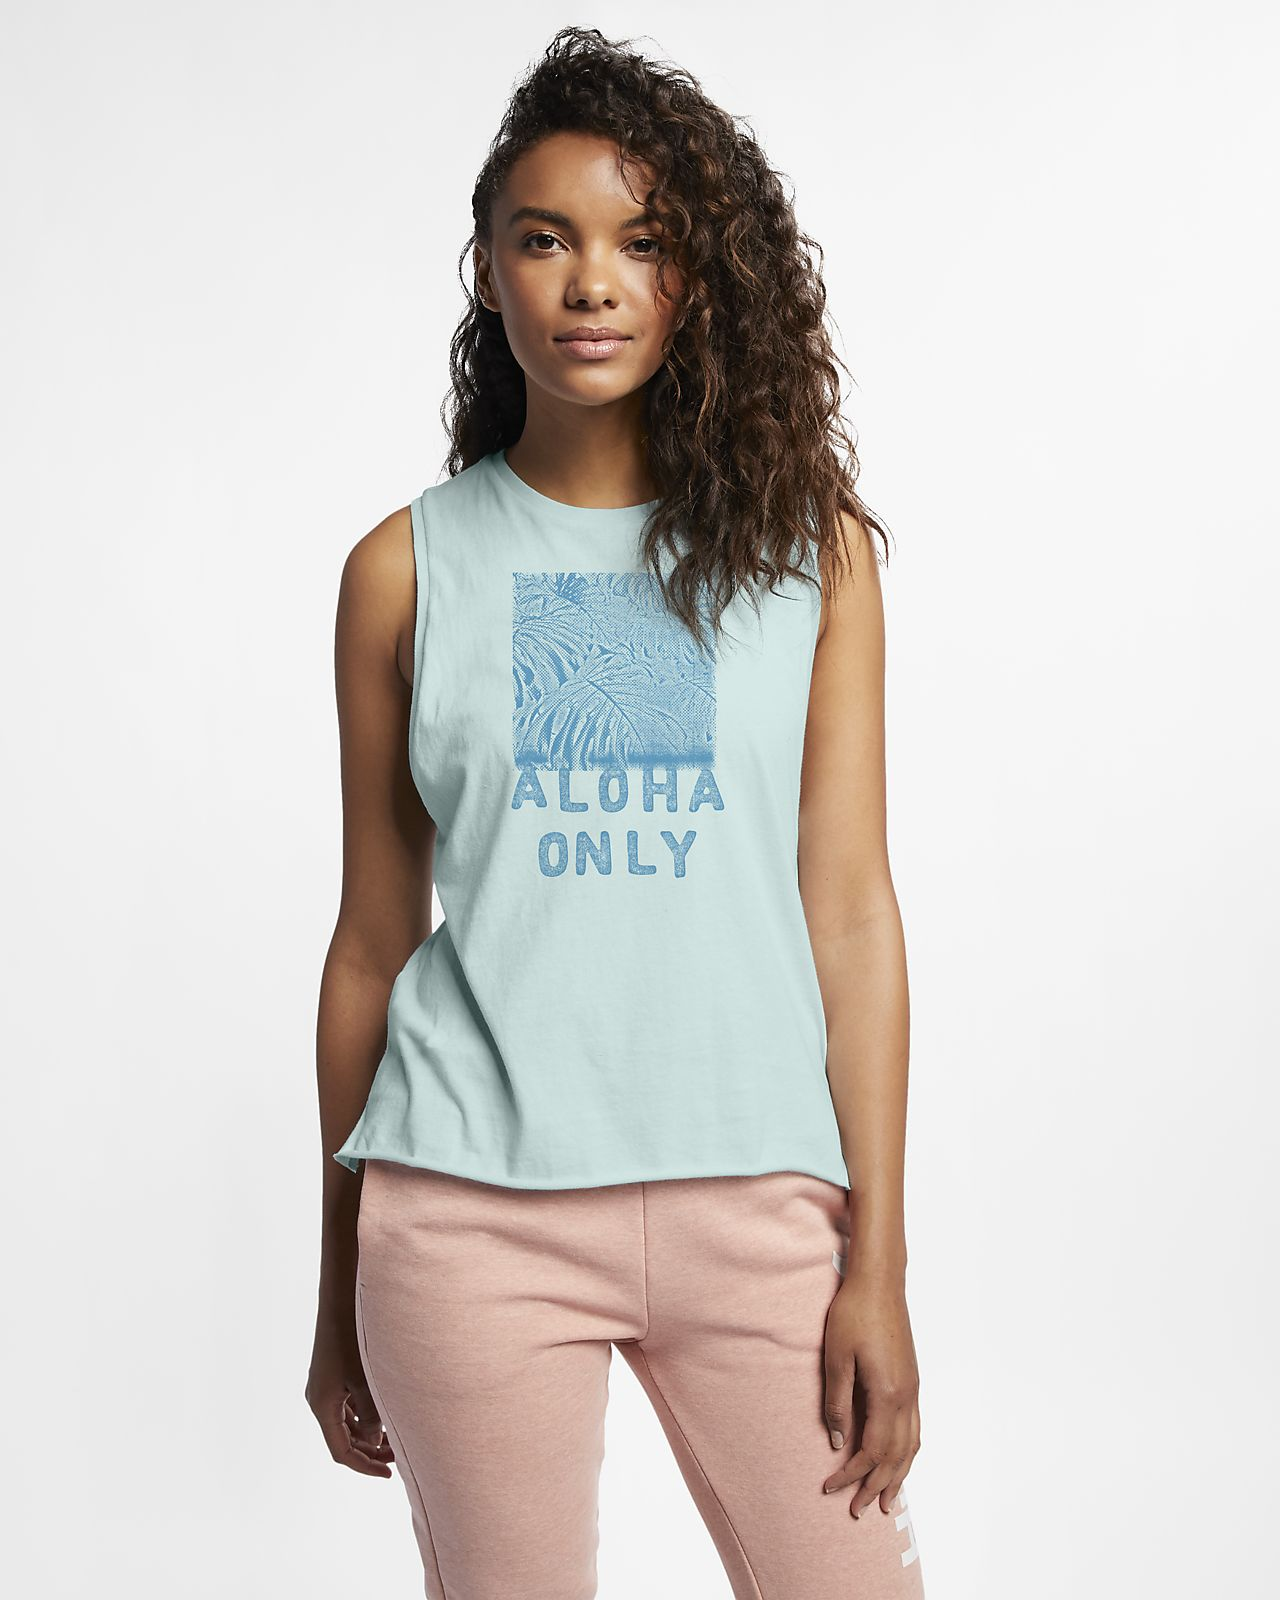 Hurley Aloha Only Camiseta de tirantes de ciclismo - Mujer